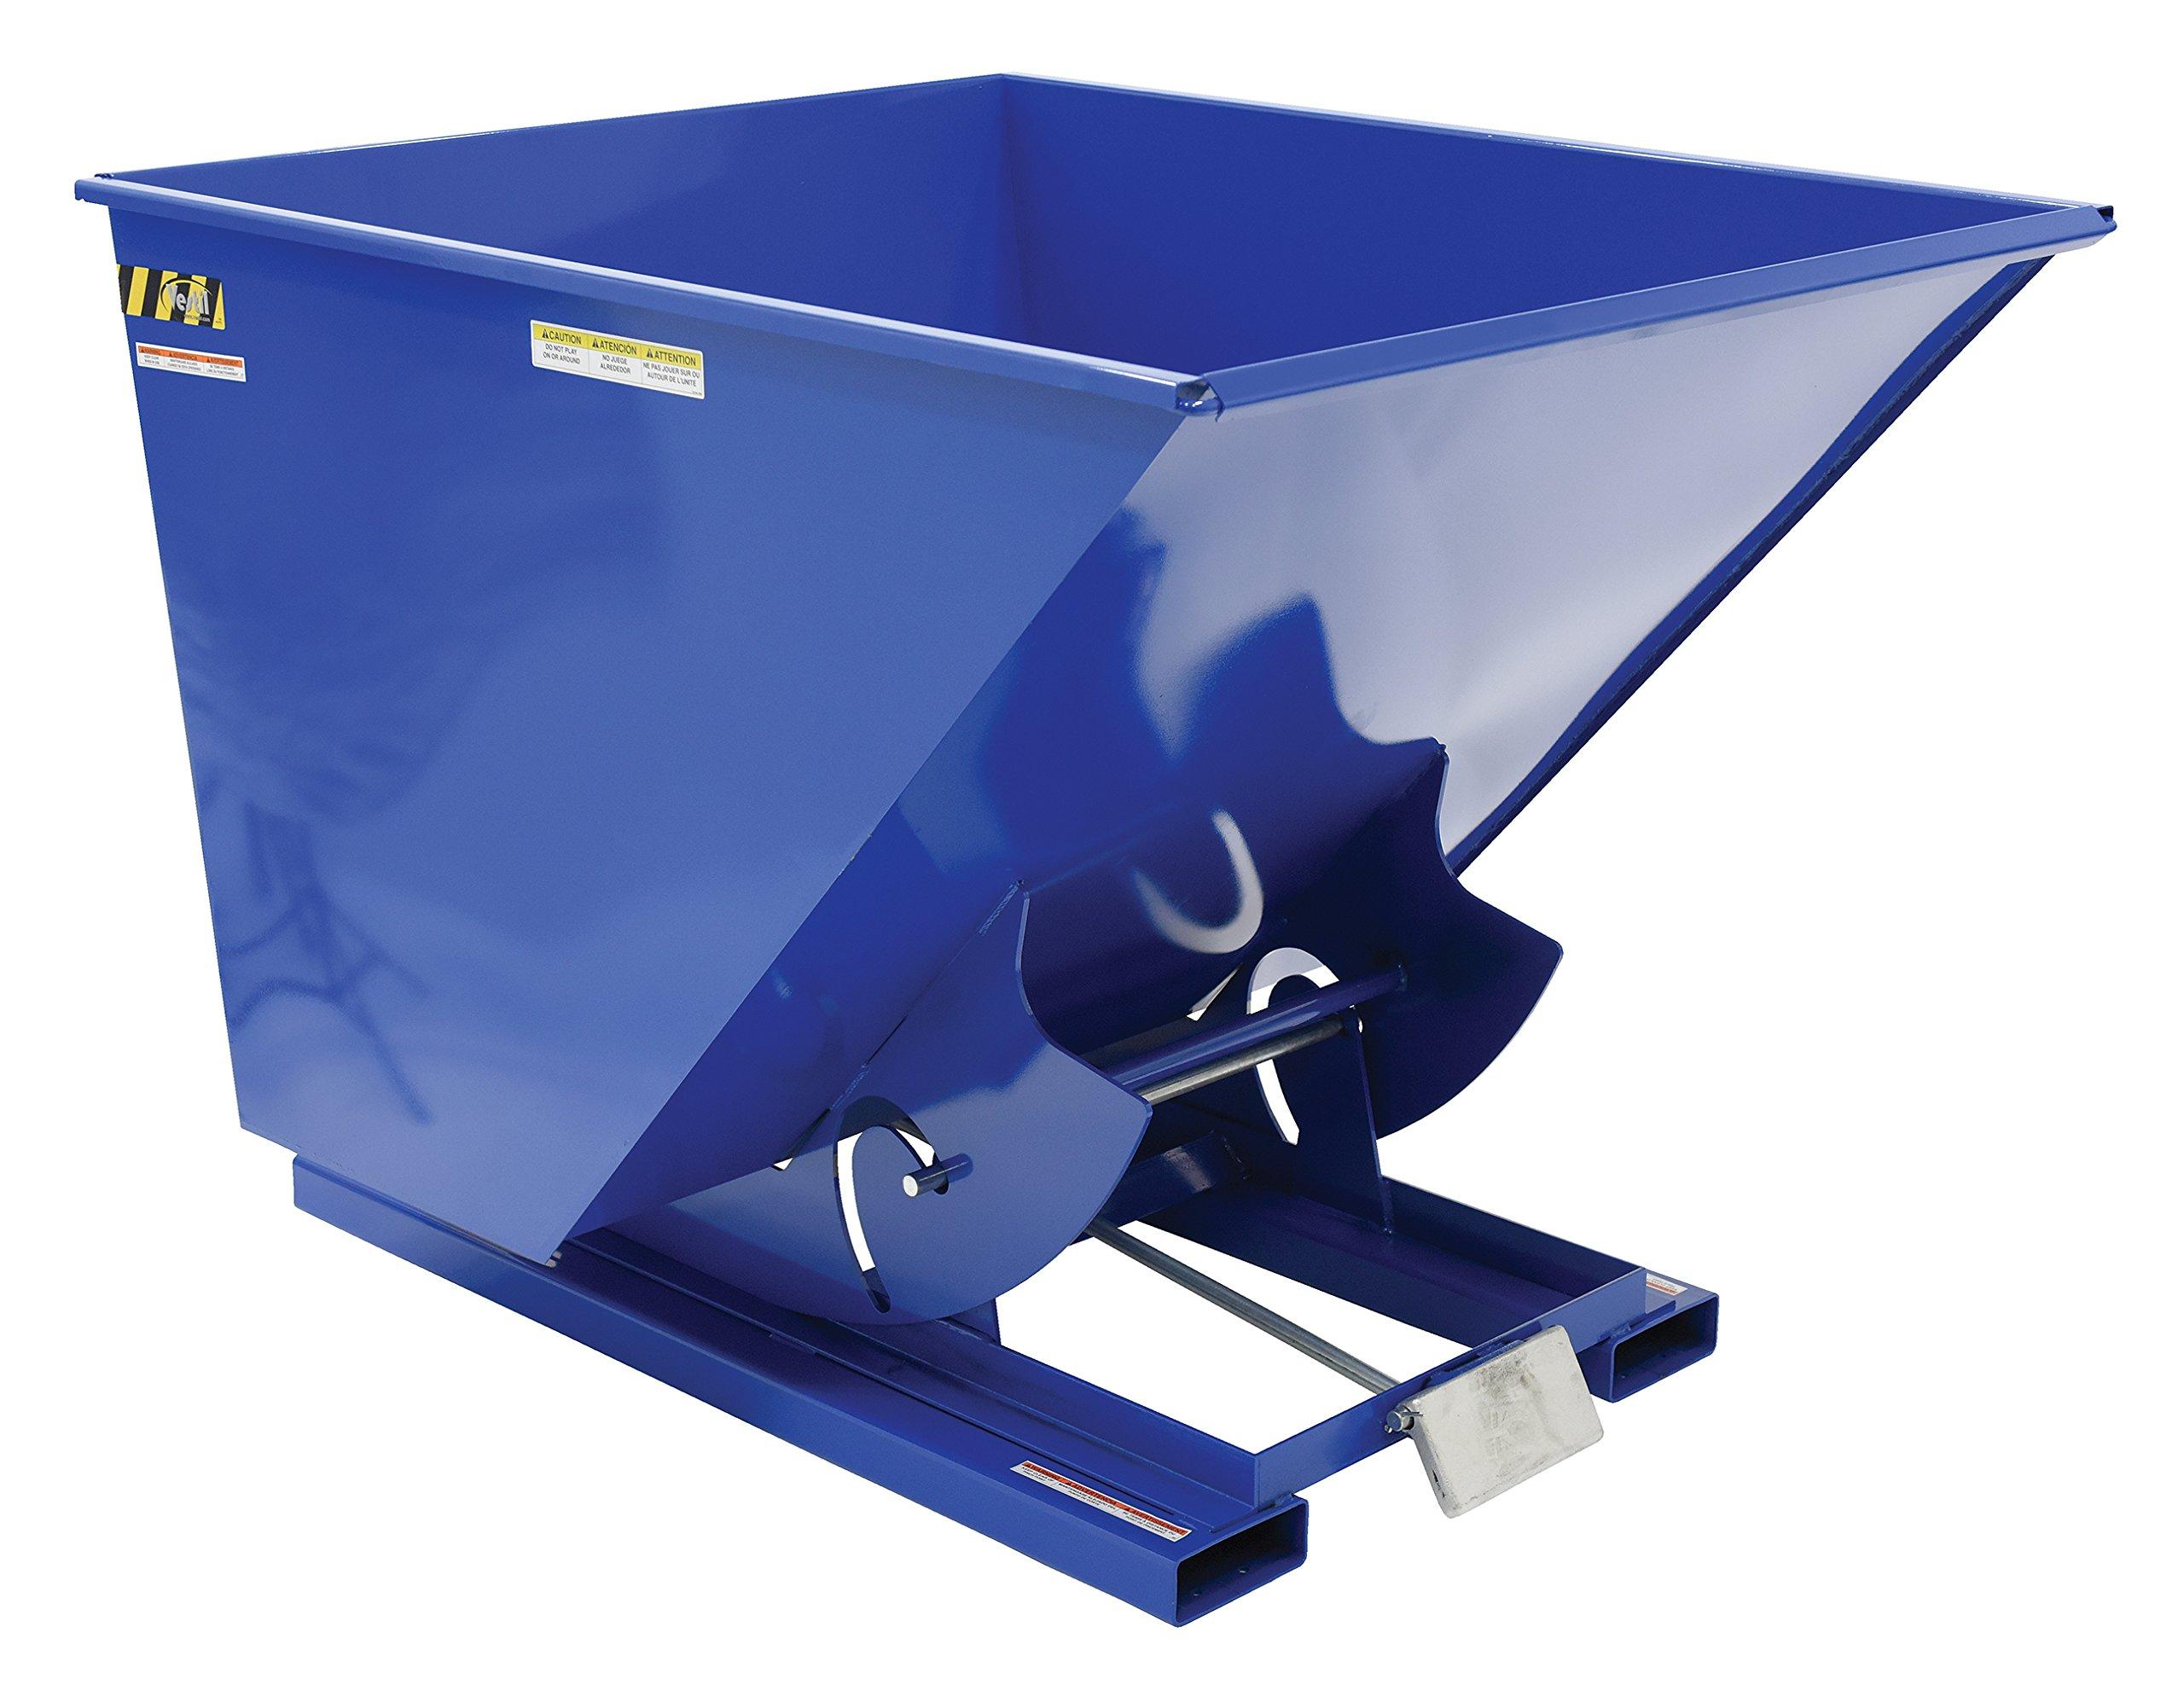 Vestil D-200-MD Medium Duty Steel Self-Dumping Hopper with Bumper Release, 4000 lbs Capacity, Overall L x W x H (in.) 68-5/16'' x 56-5/8'' x 51-13/16'', Blue